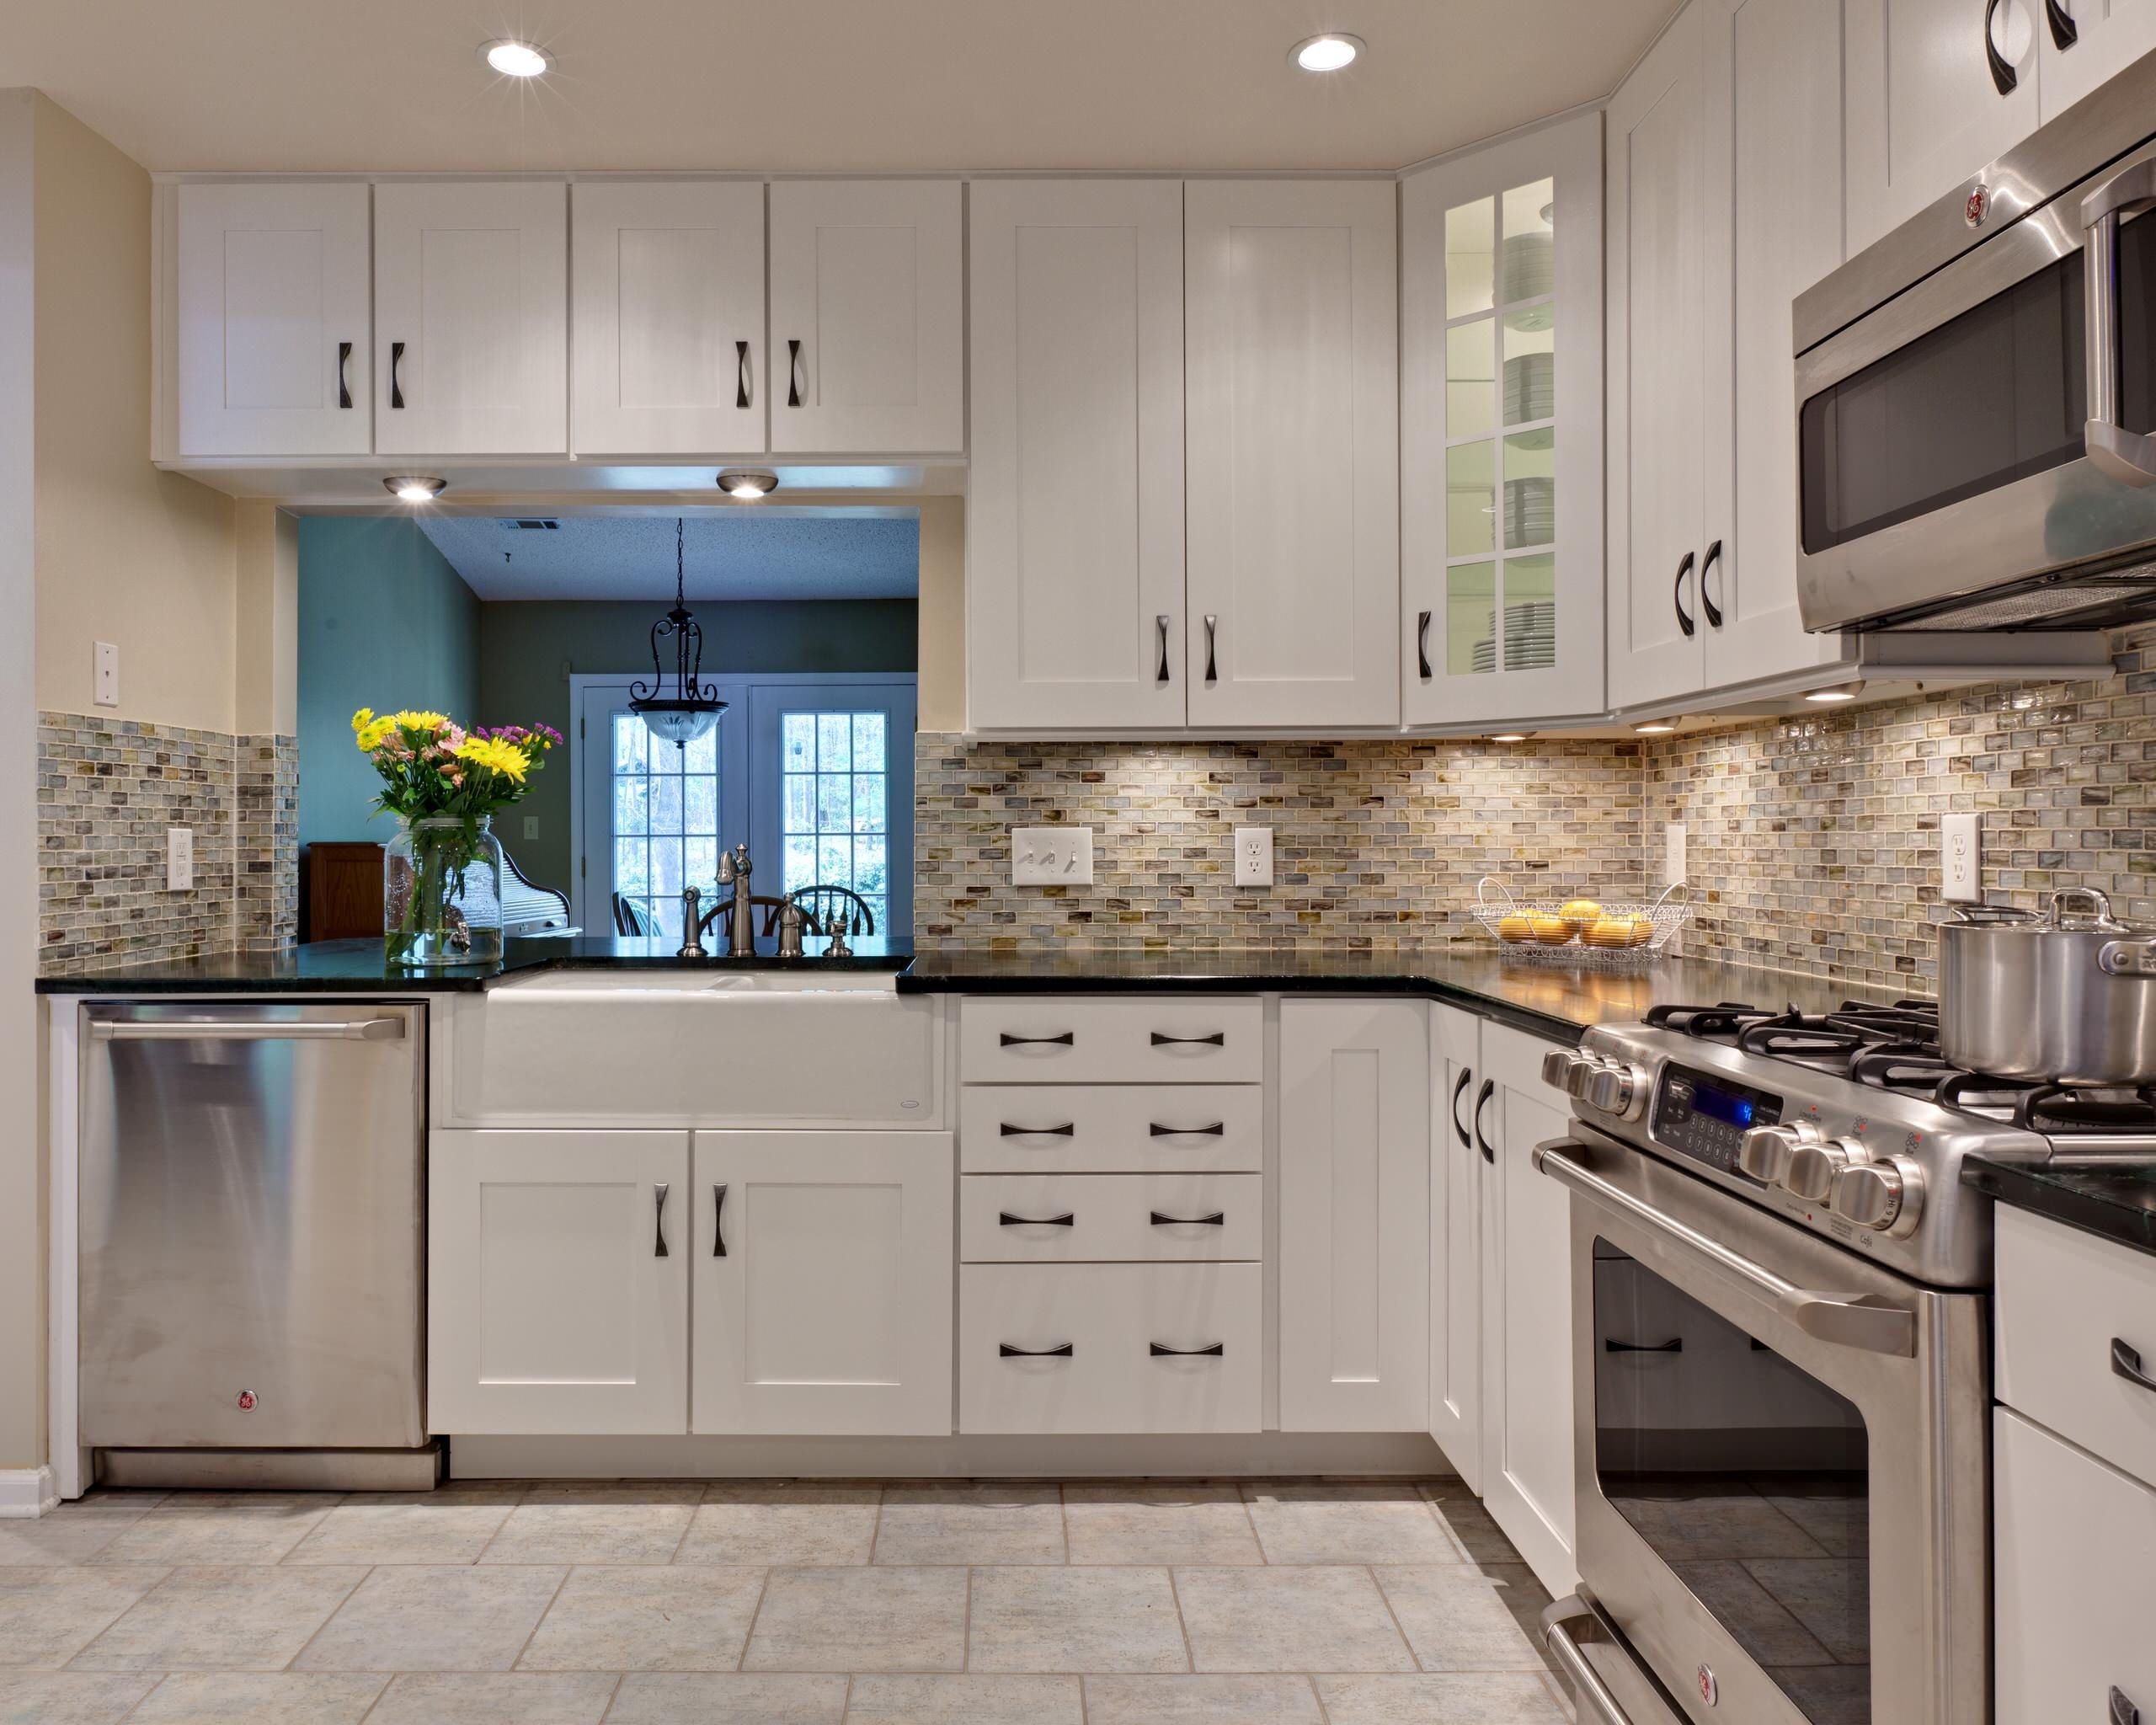 Updated Inexpensive Backsplash Creates A Stunning Kitchen: Kitchen Design  With White Kitchen Cabinets And Inexpensive